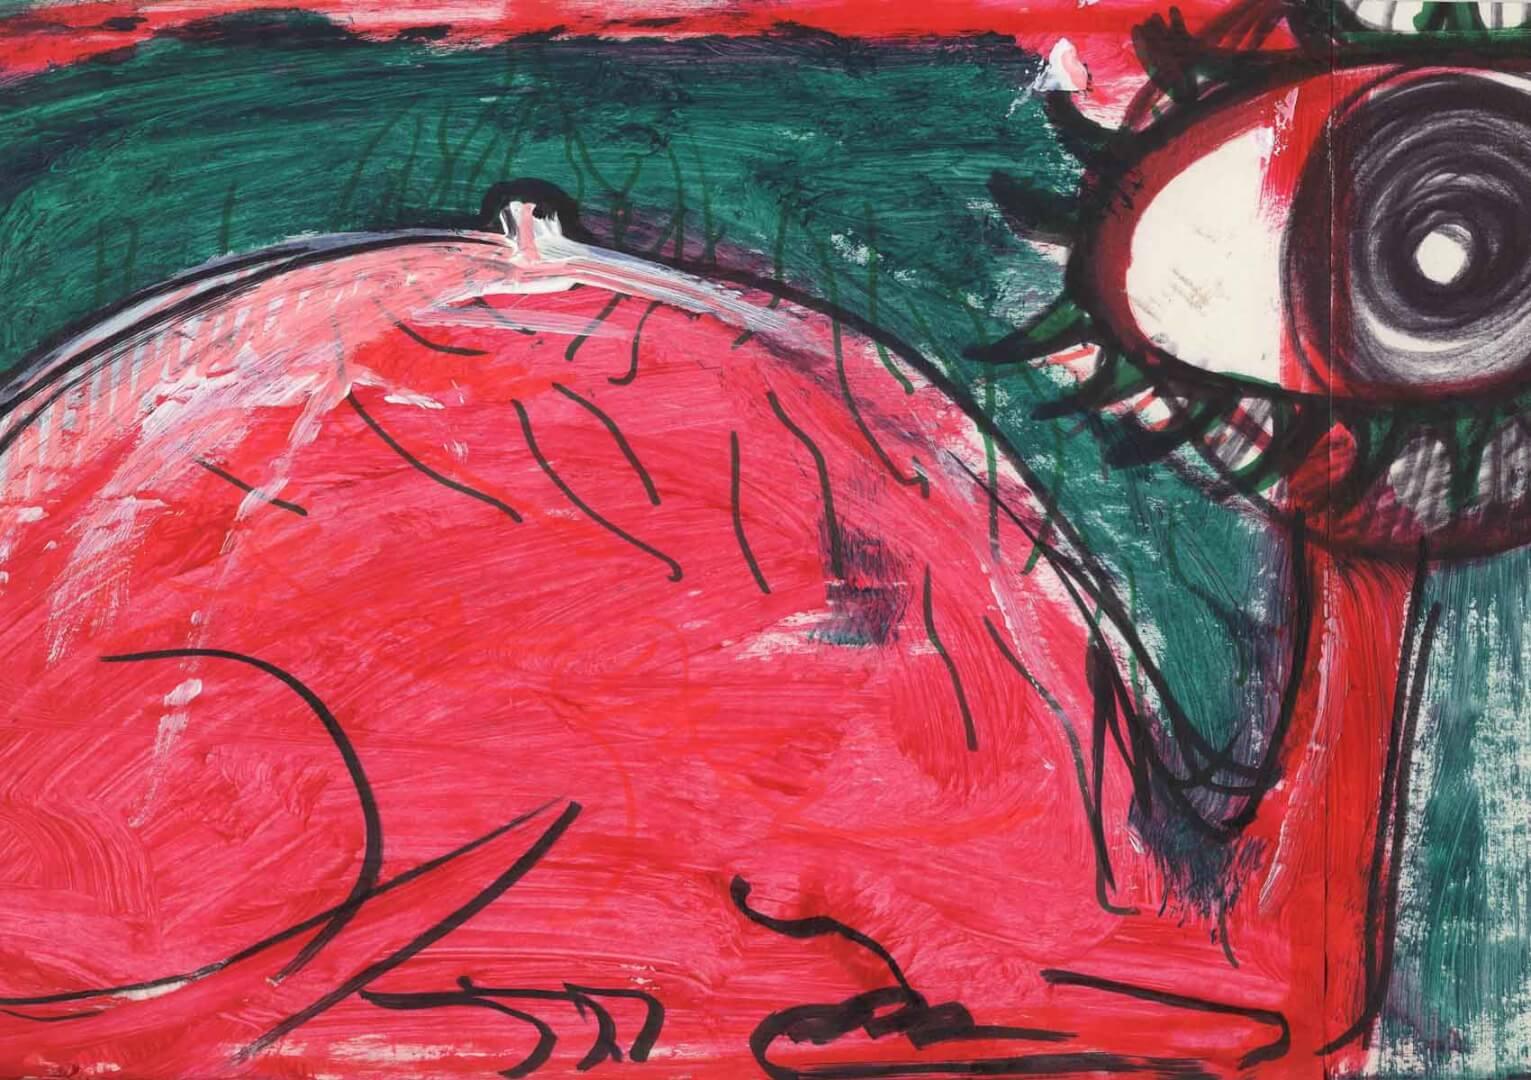 Recto verso 2 © David Noir | Dessins, peintures, collages